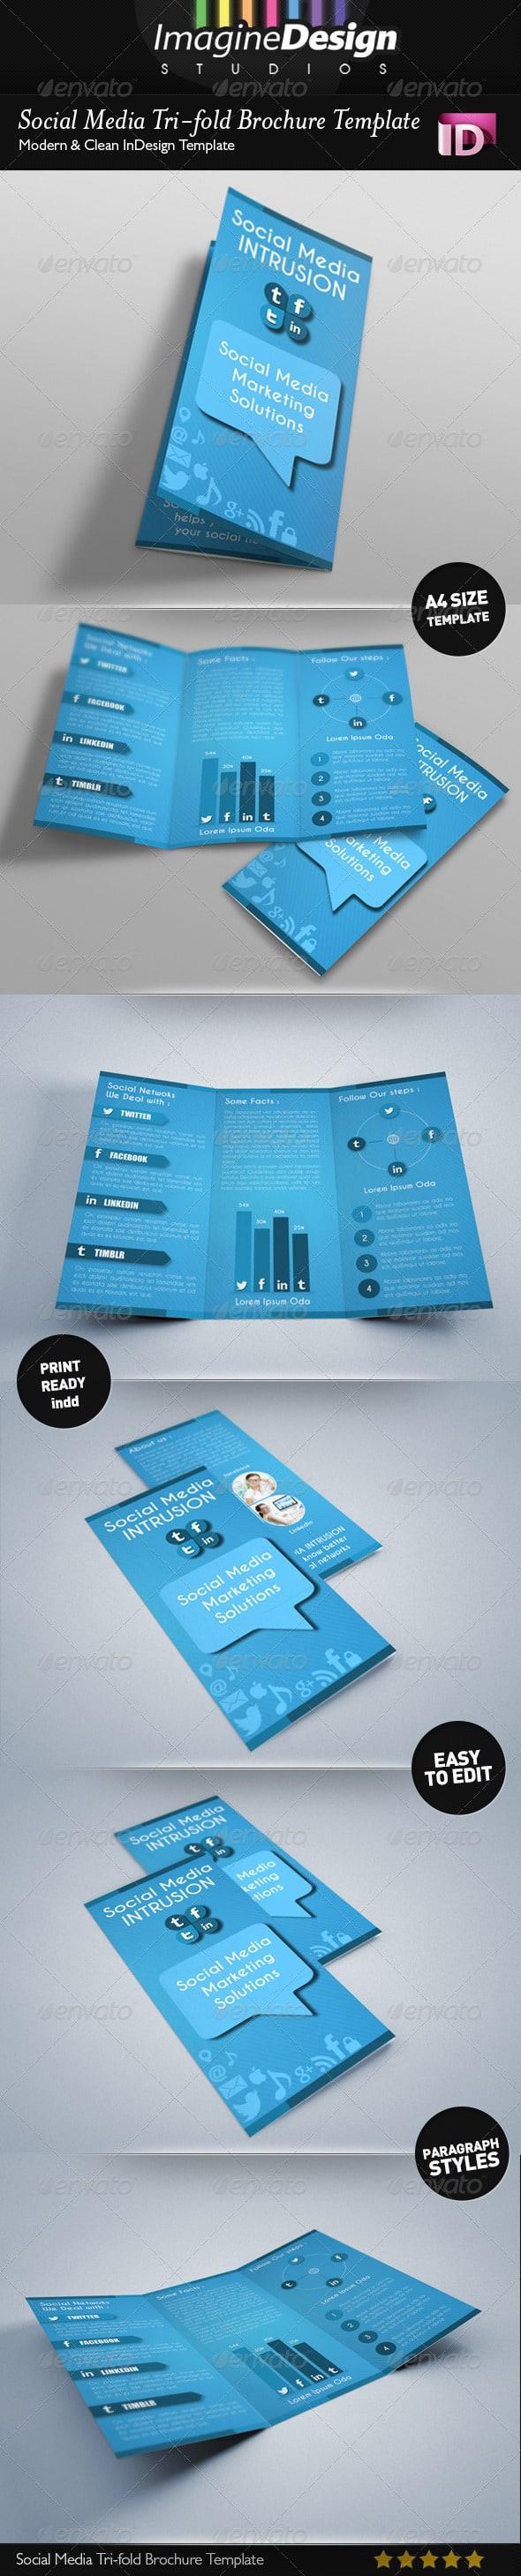 Social Media Tri-fold Brochure Template